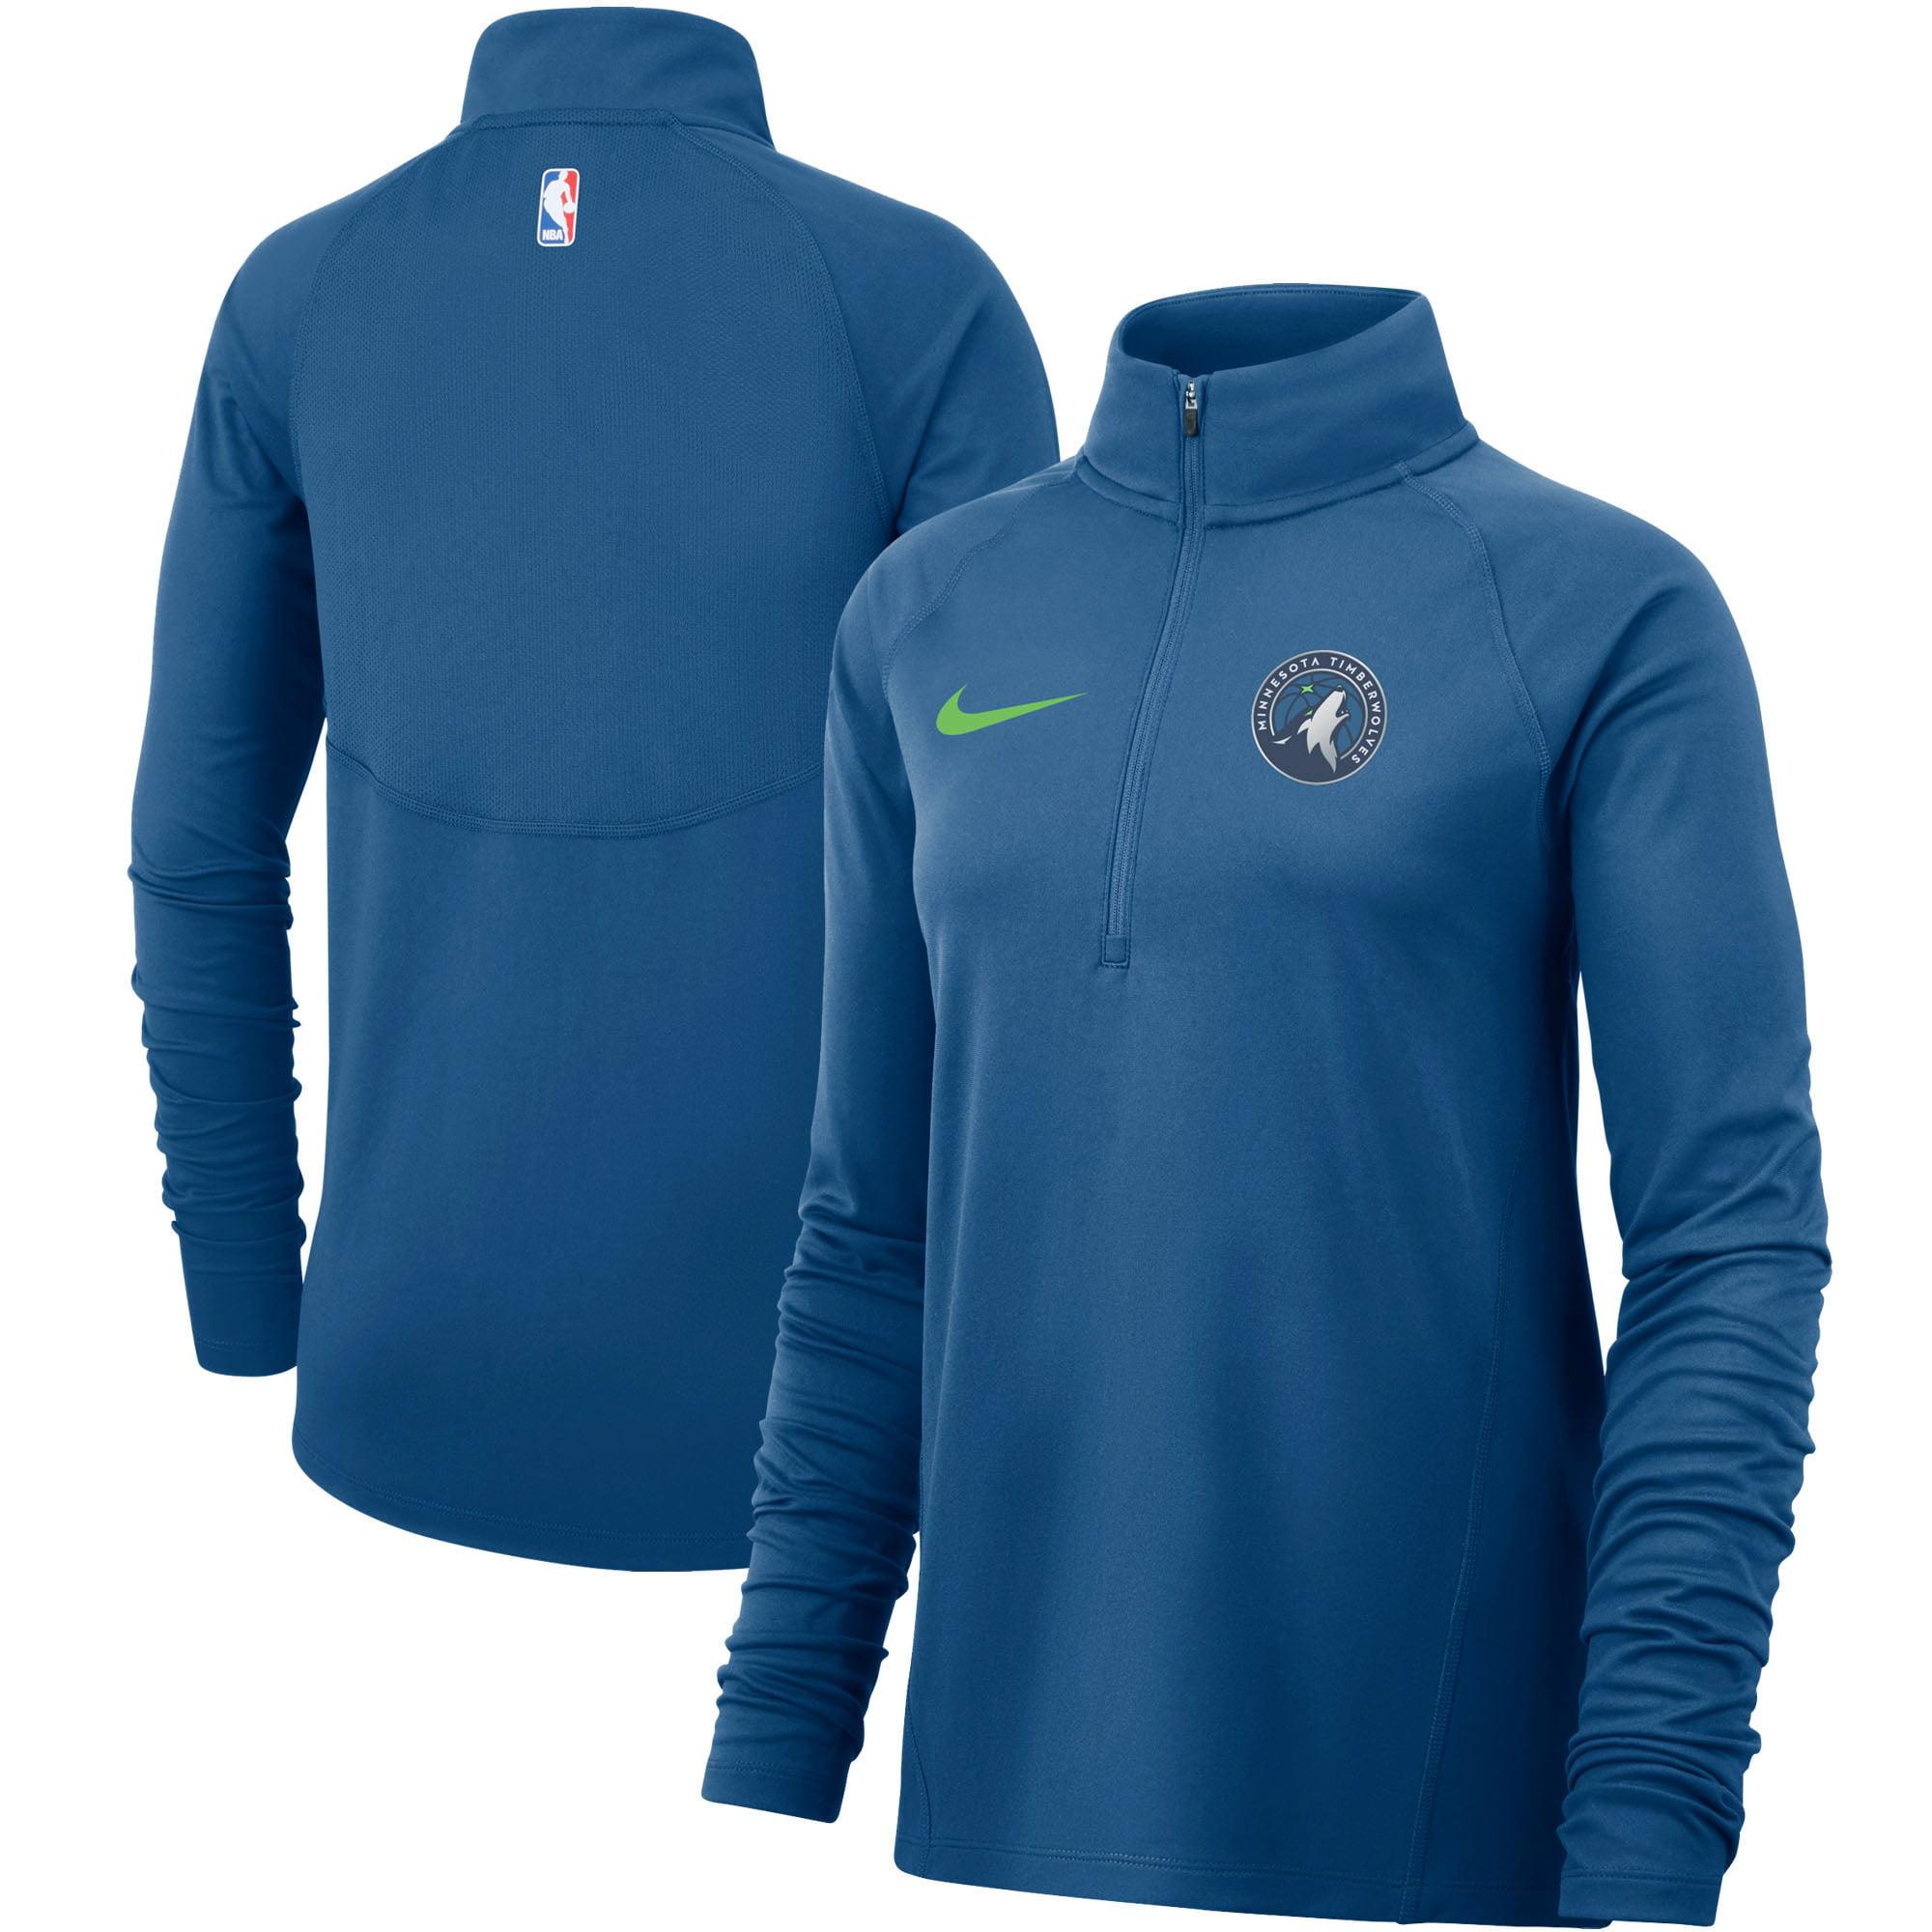 Minnesota Timberwolves Nike Women's Element Performance Raglan Sleeve Half-Zip Pullover Jacket - Blue